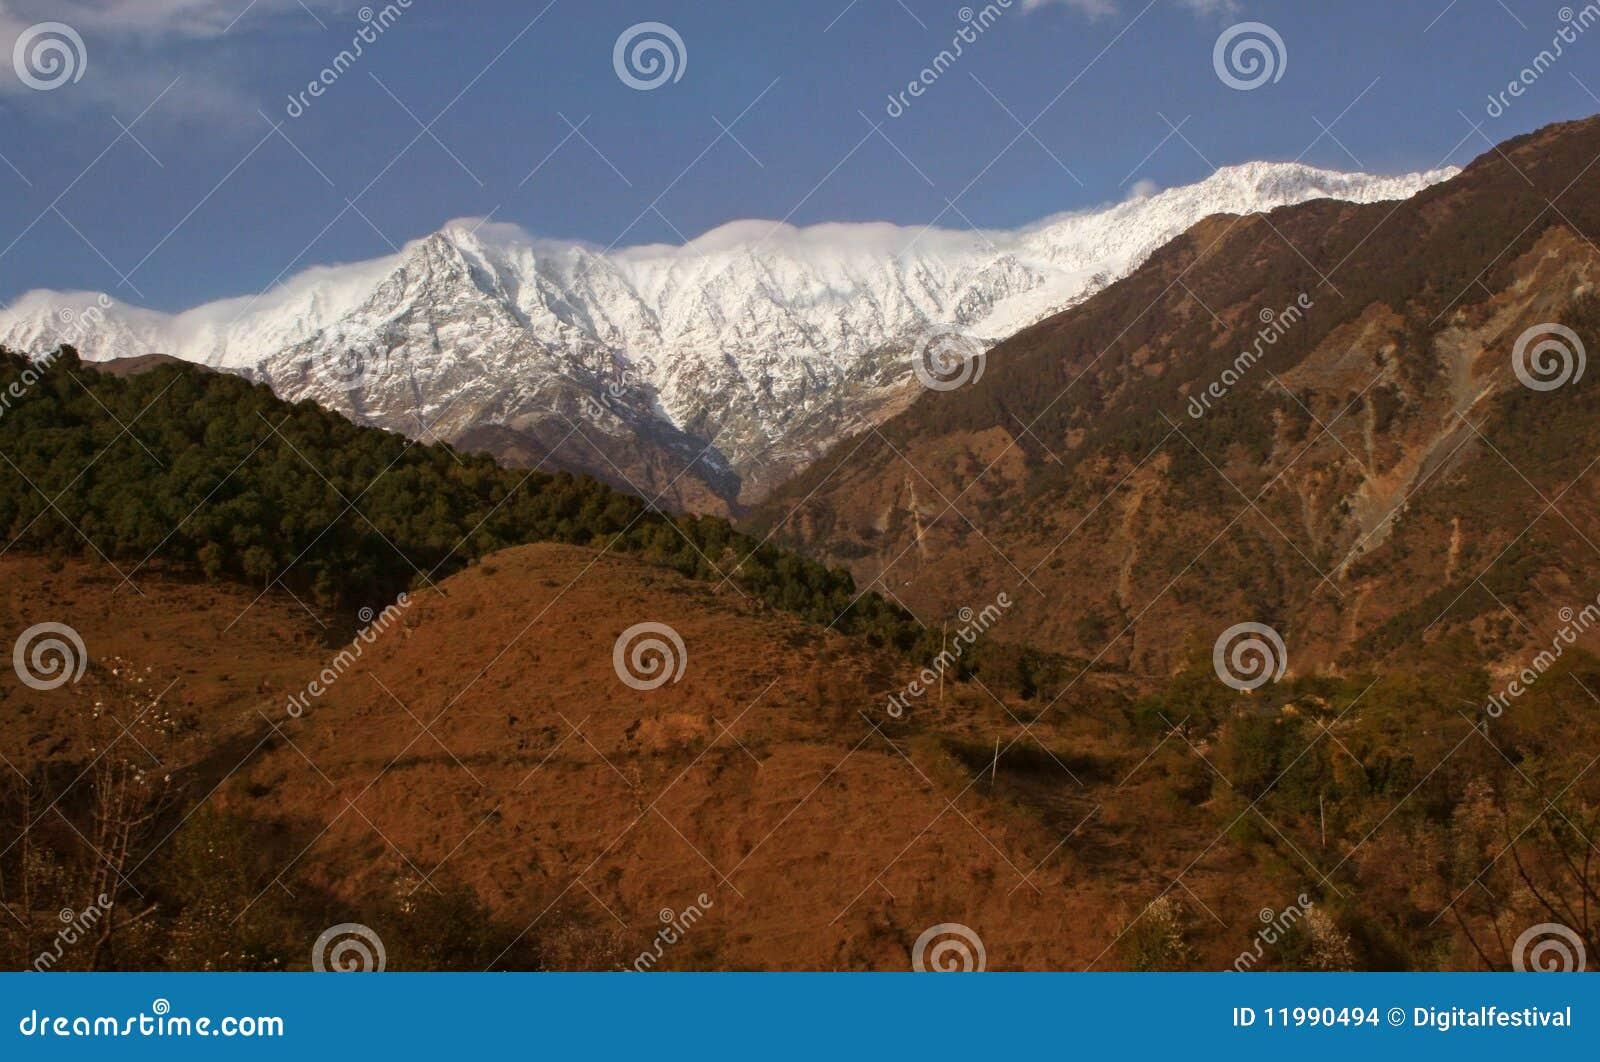 Deforestationhimalayas india maximal snow